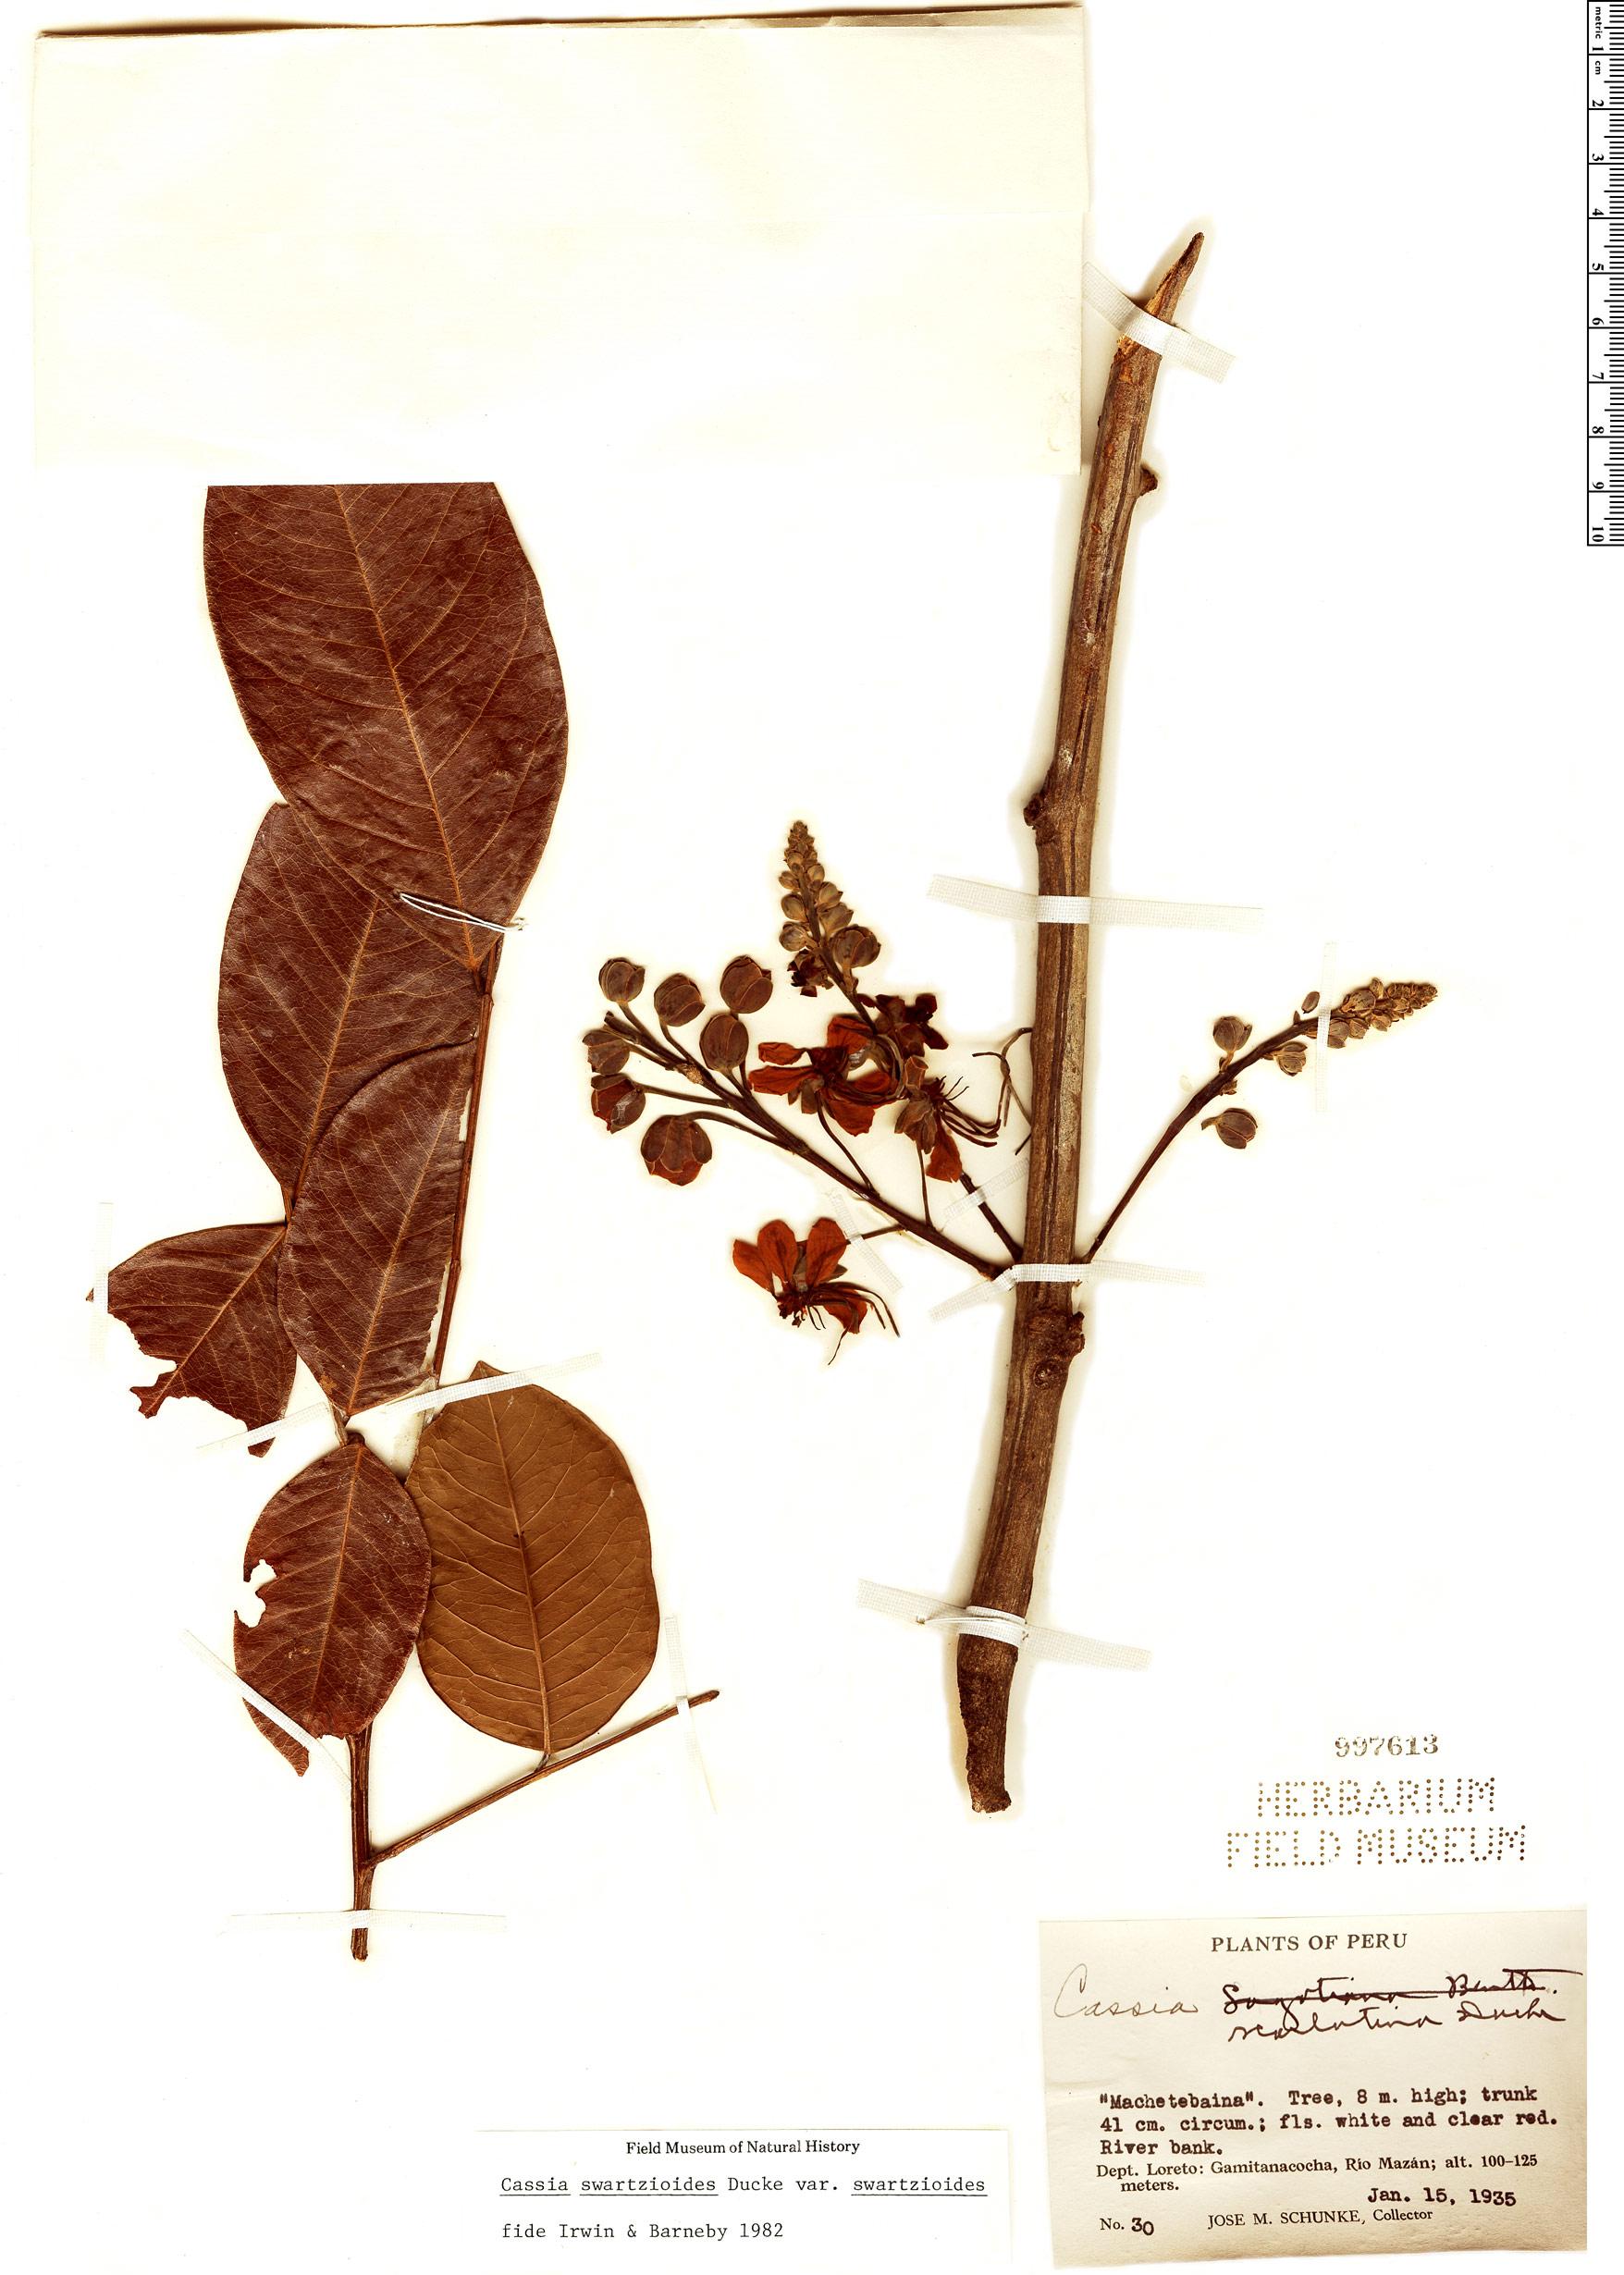 Specimen: Cassia swartzioides